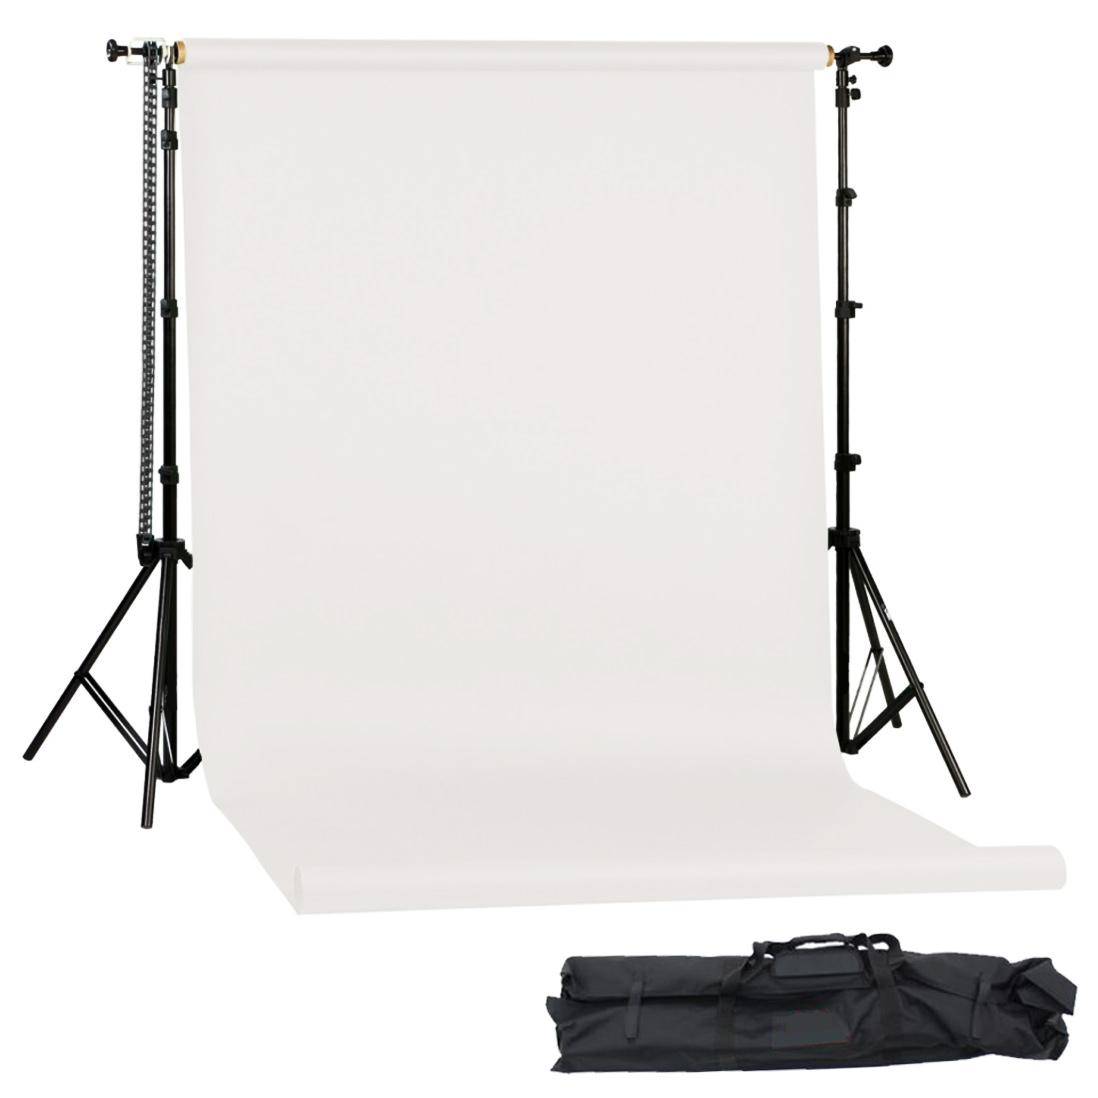 Mobiles Hintergrundkarton Set Arctic Weiß 1,35x11m